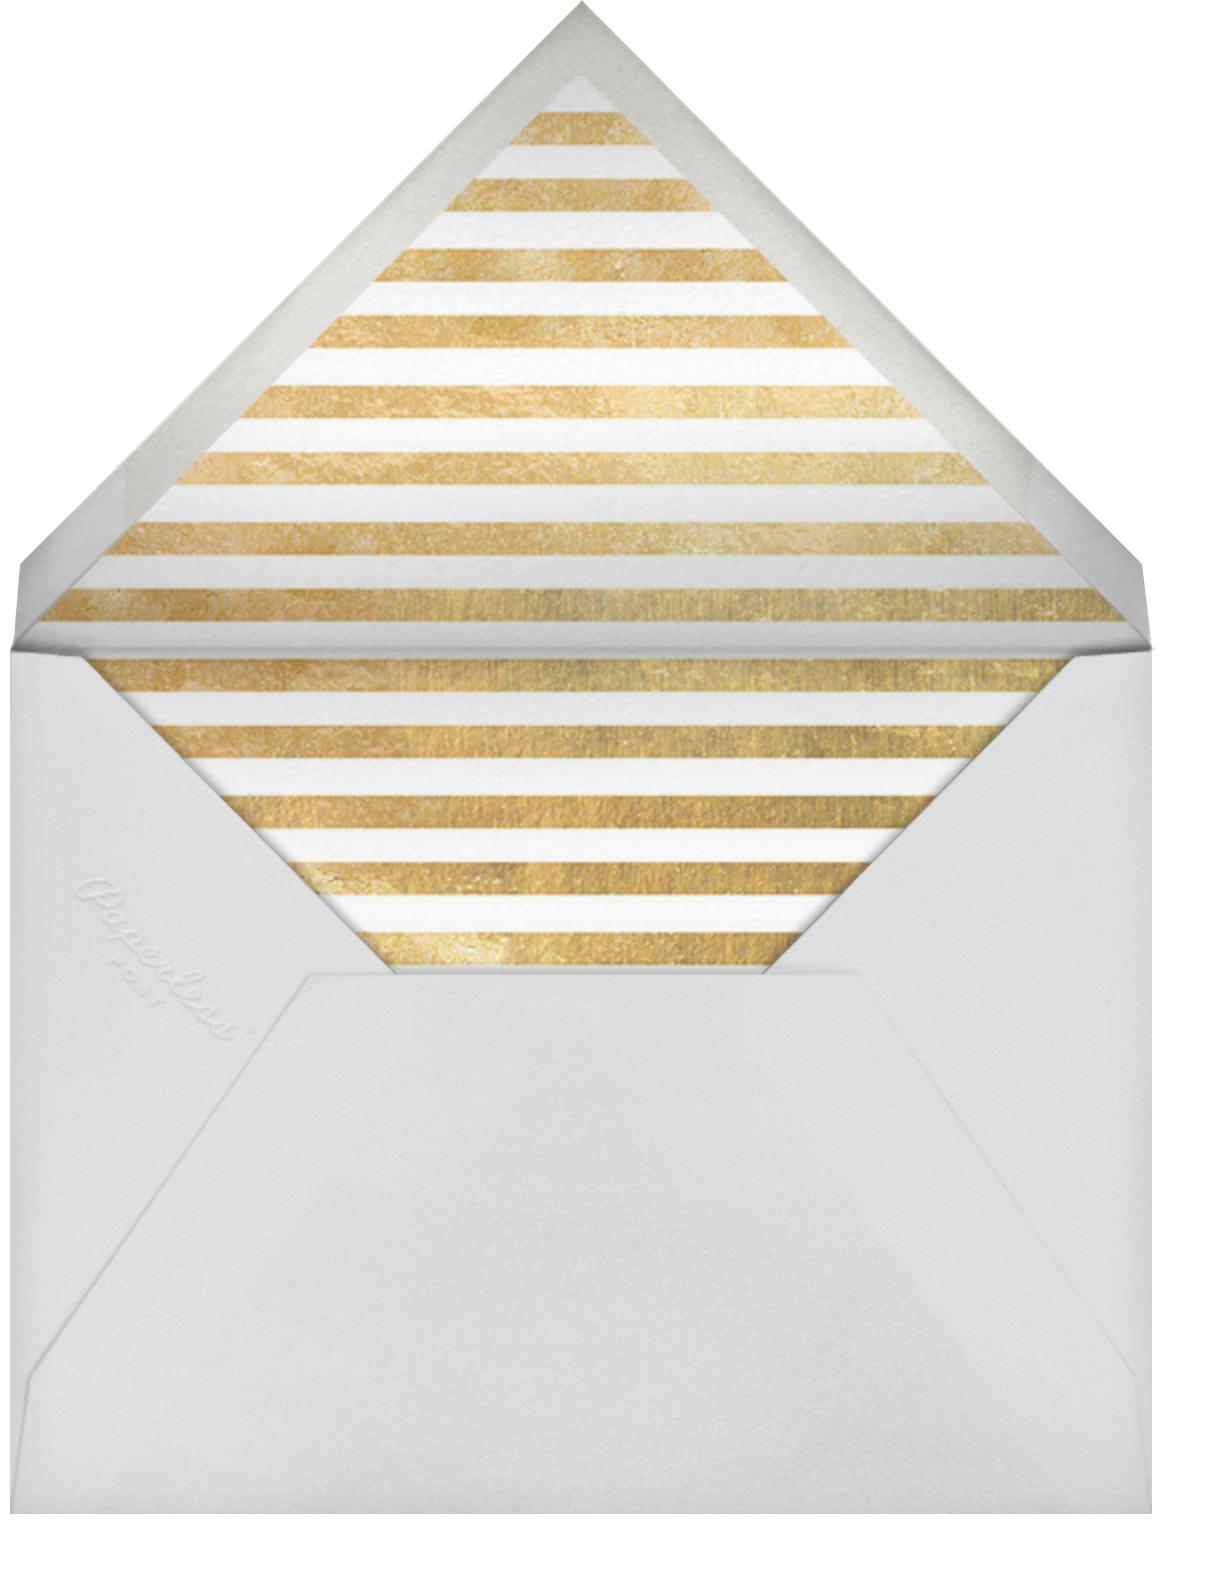 Field of Thanks - Glacier/Gold - Paperless Post - General - envelope back